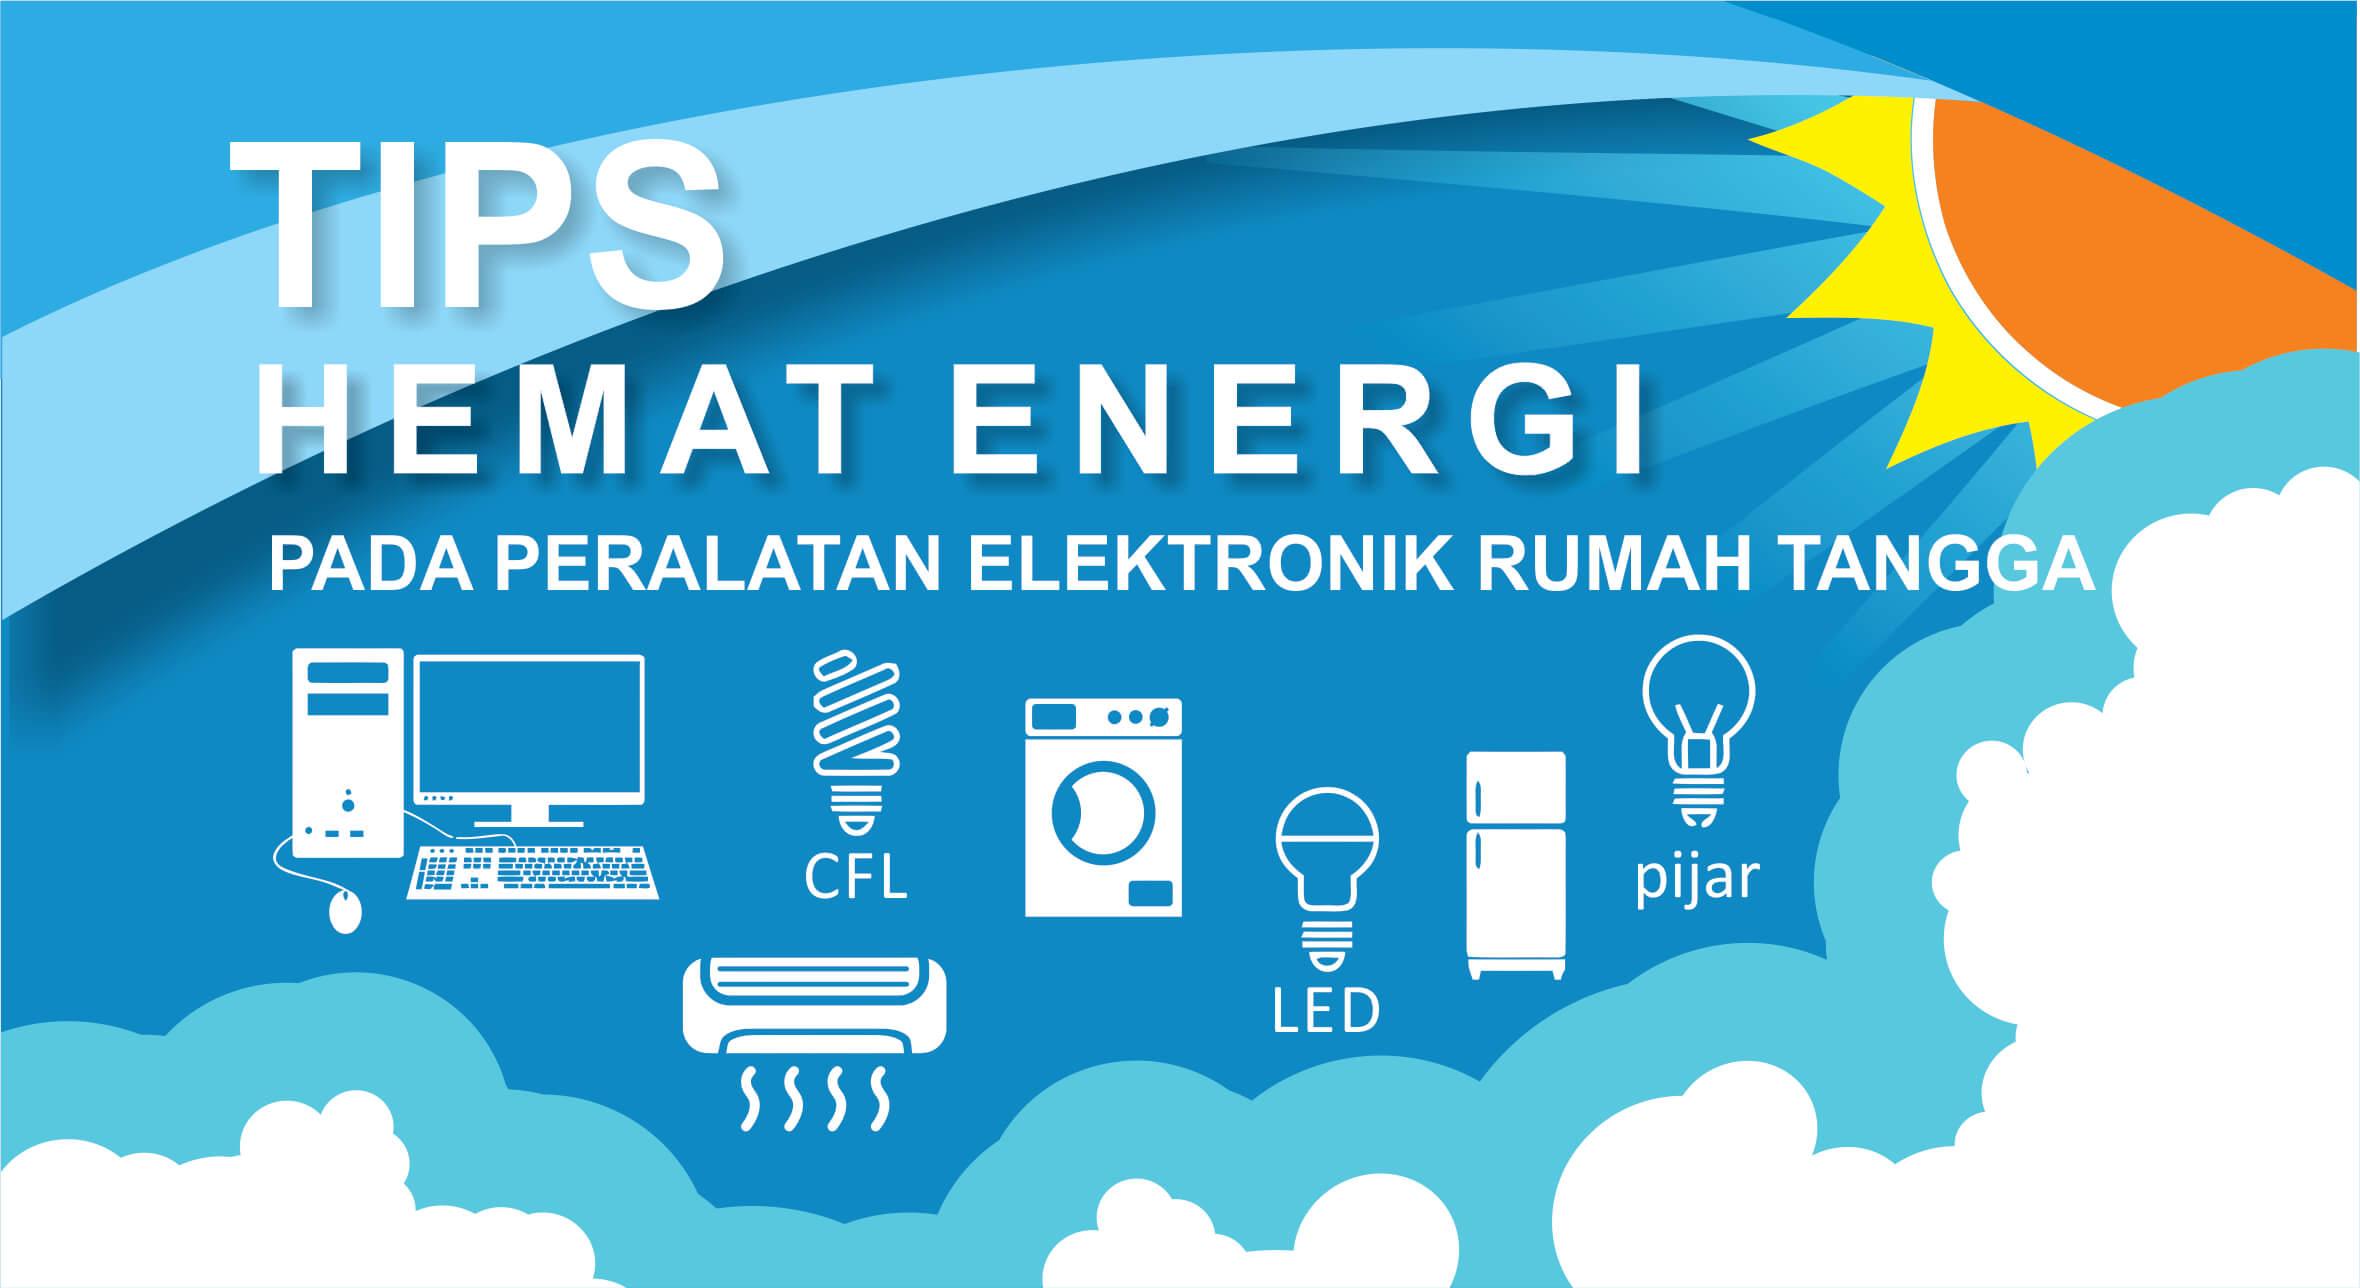 Tips Hemat Energi Pada Peralatan Elektronik Rumah Tangga Pt Surya